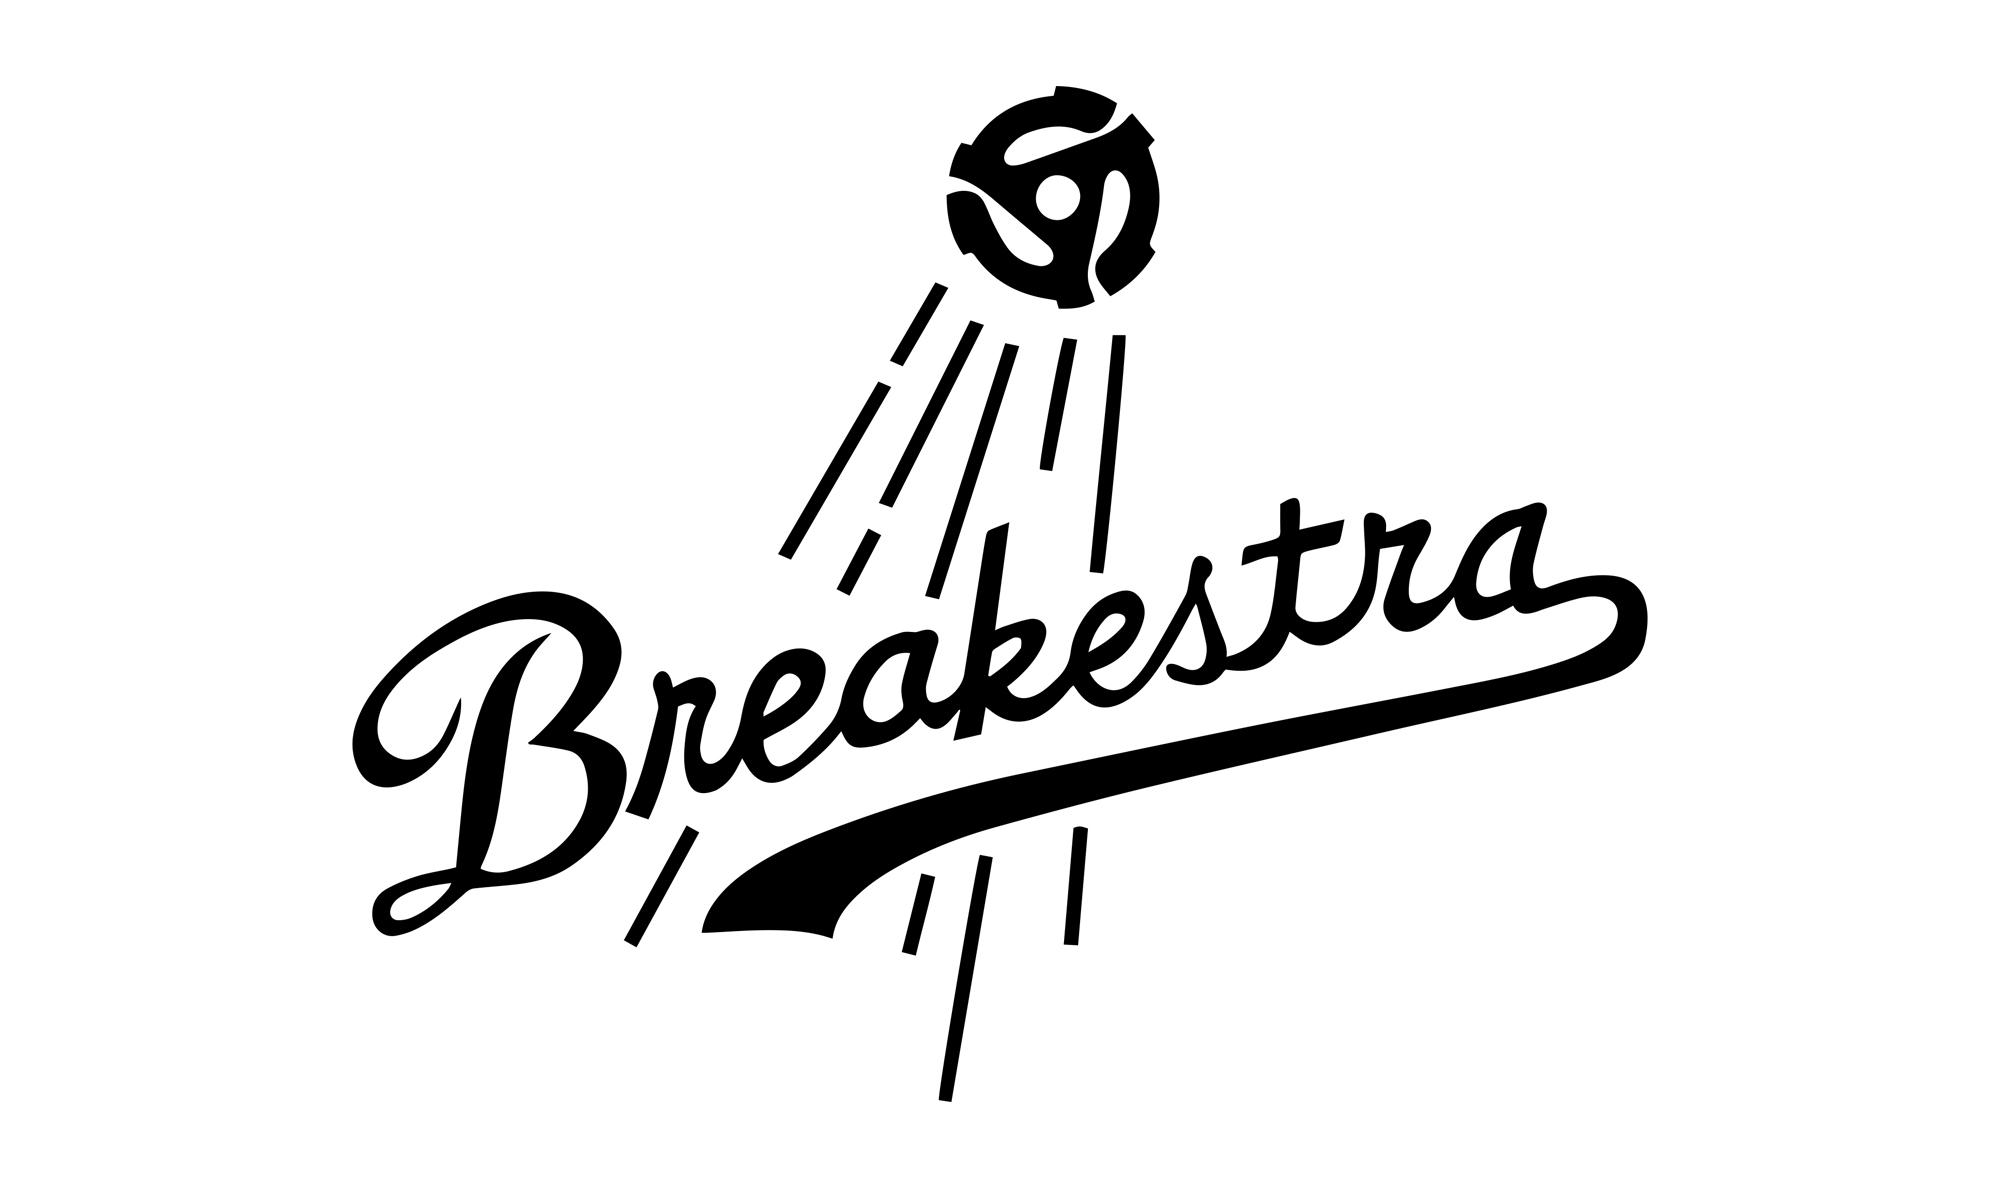 breakestra.com